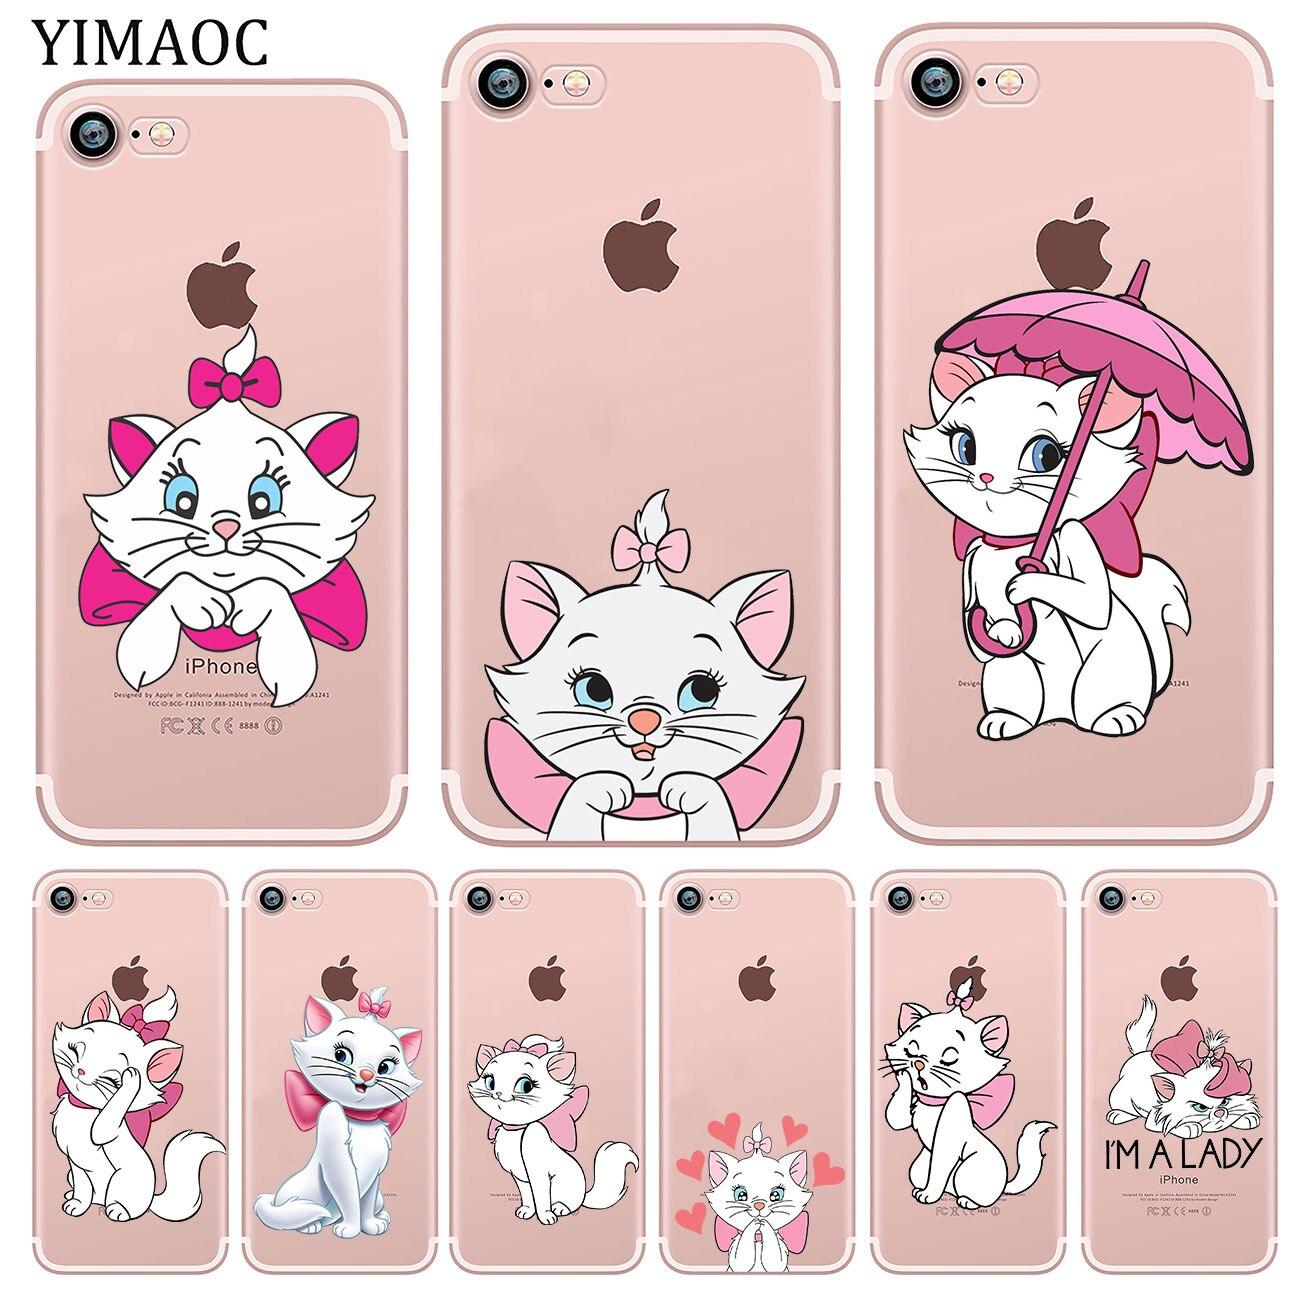 YIMAOC le dessin anim aristochats Marie chat coque de t l phone en Silicone souple tui